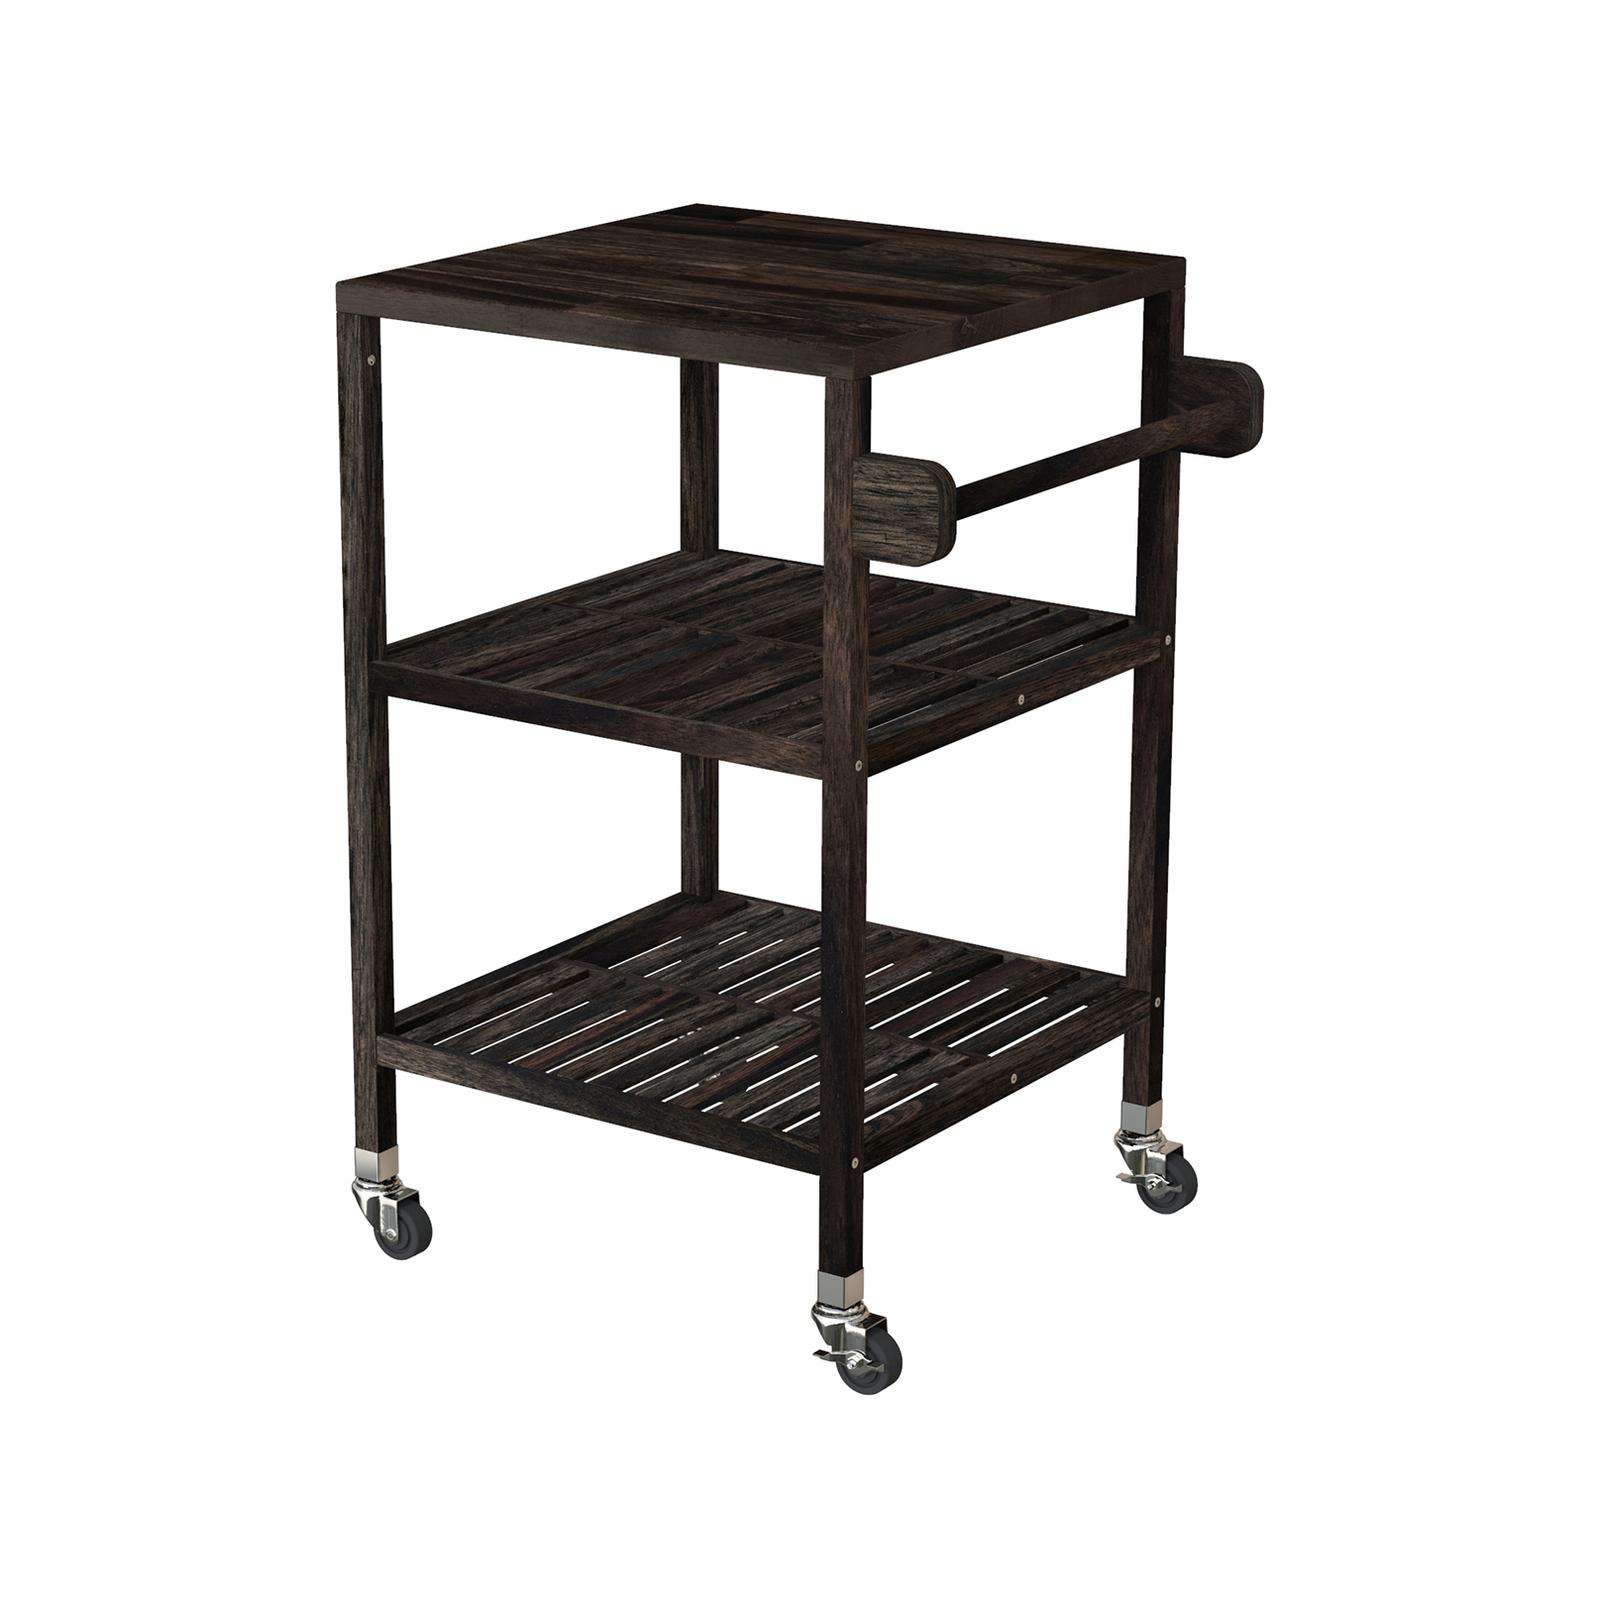 Interbuild 52 x 52 x 85cm Espresso Holger Quattro Kitchen Cart